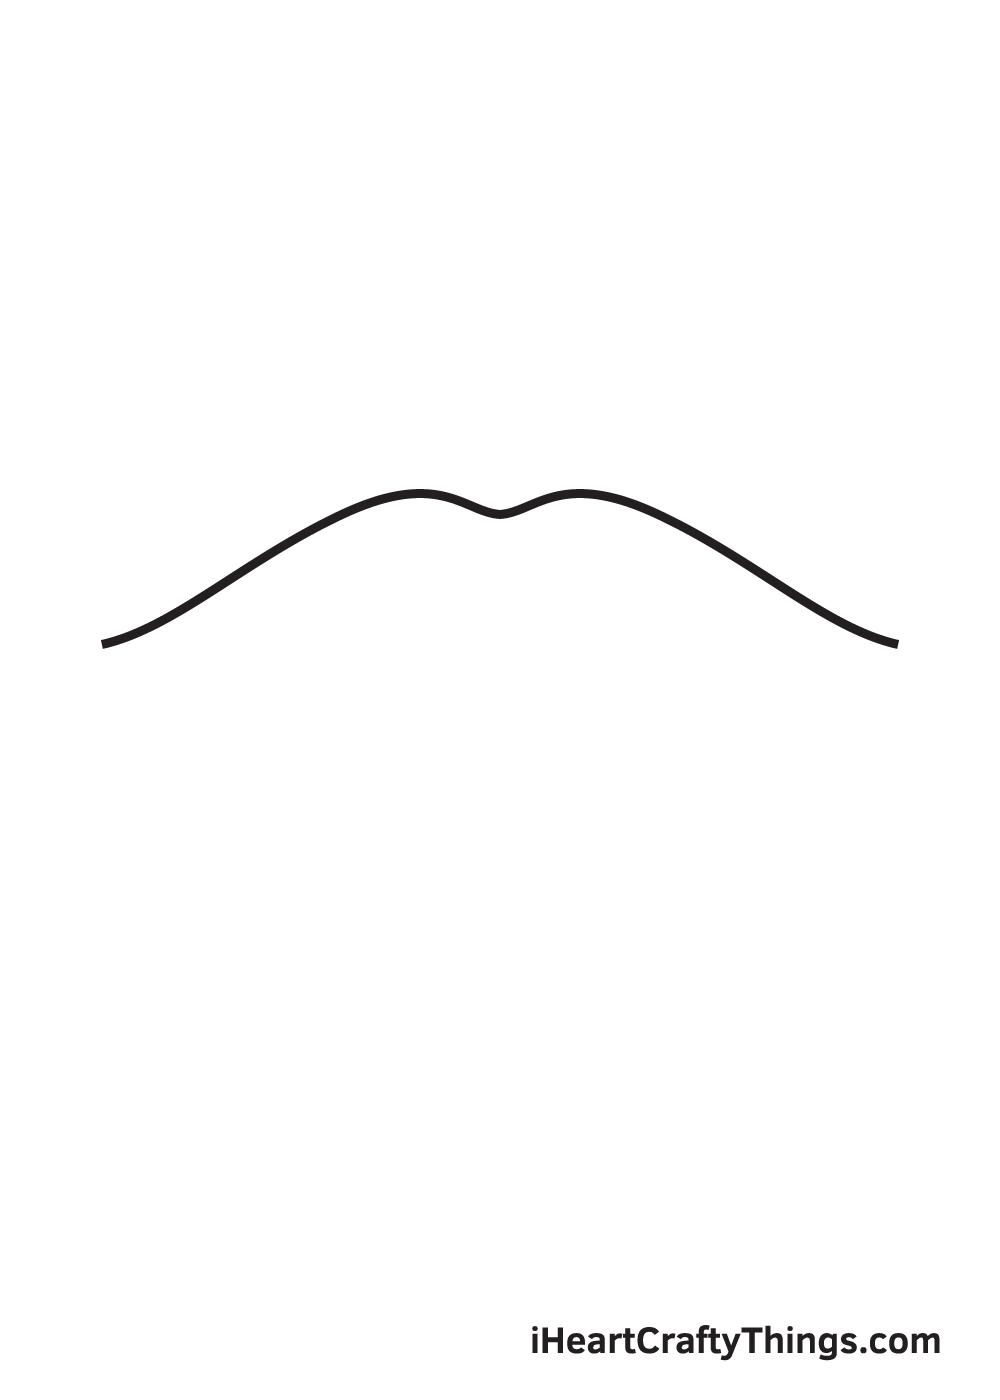 lips drawing step 2